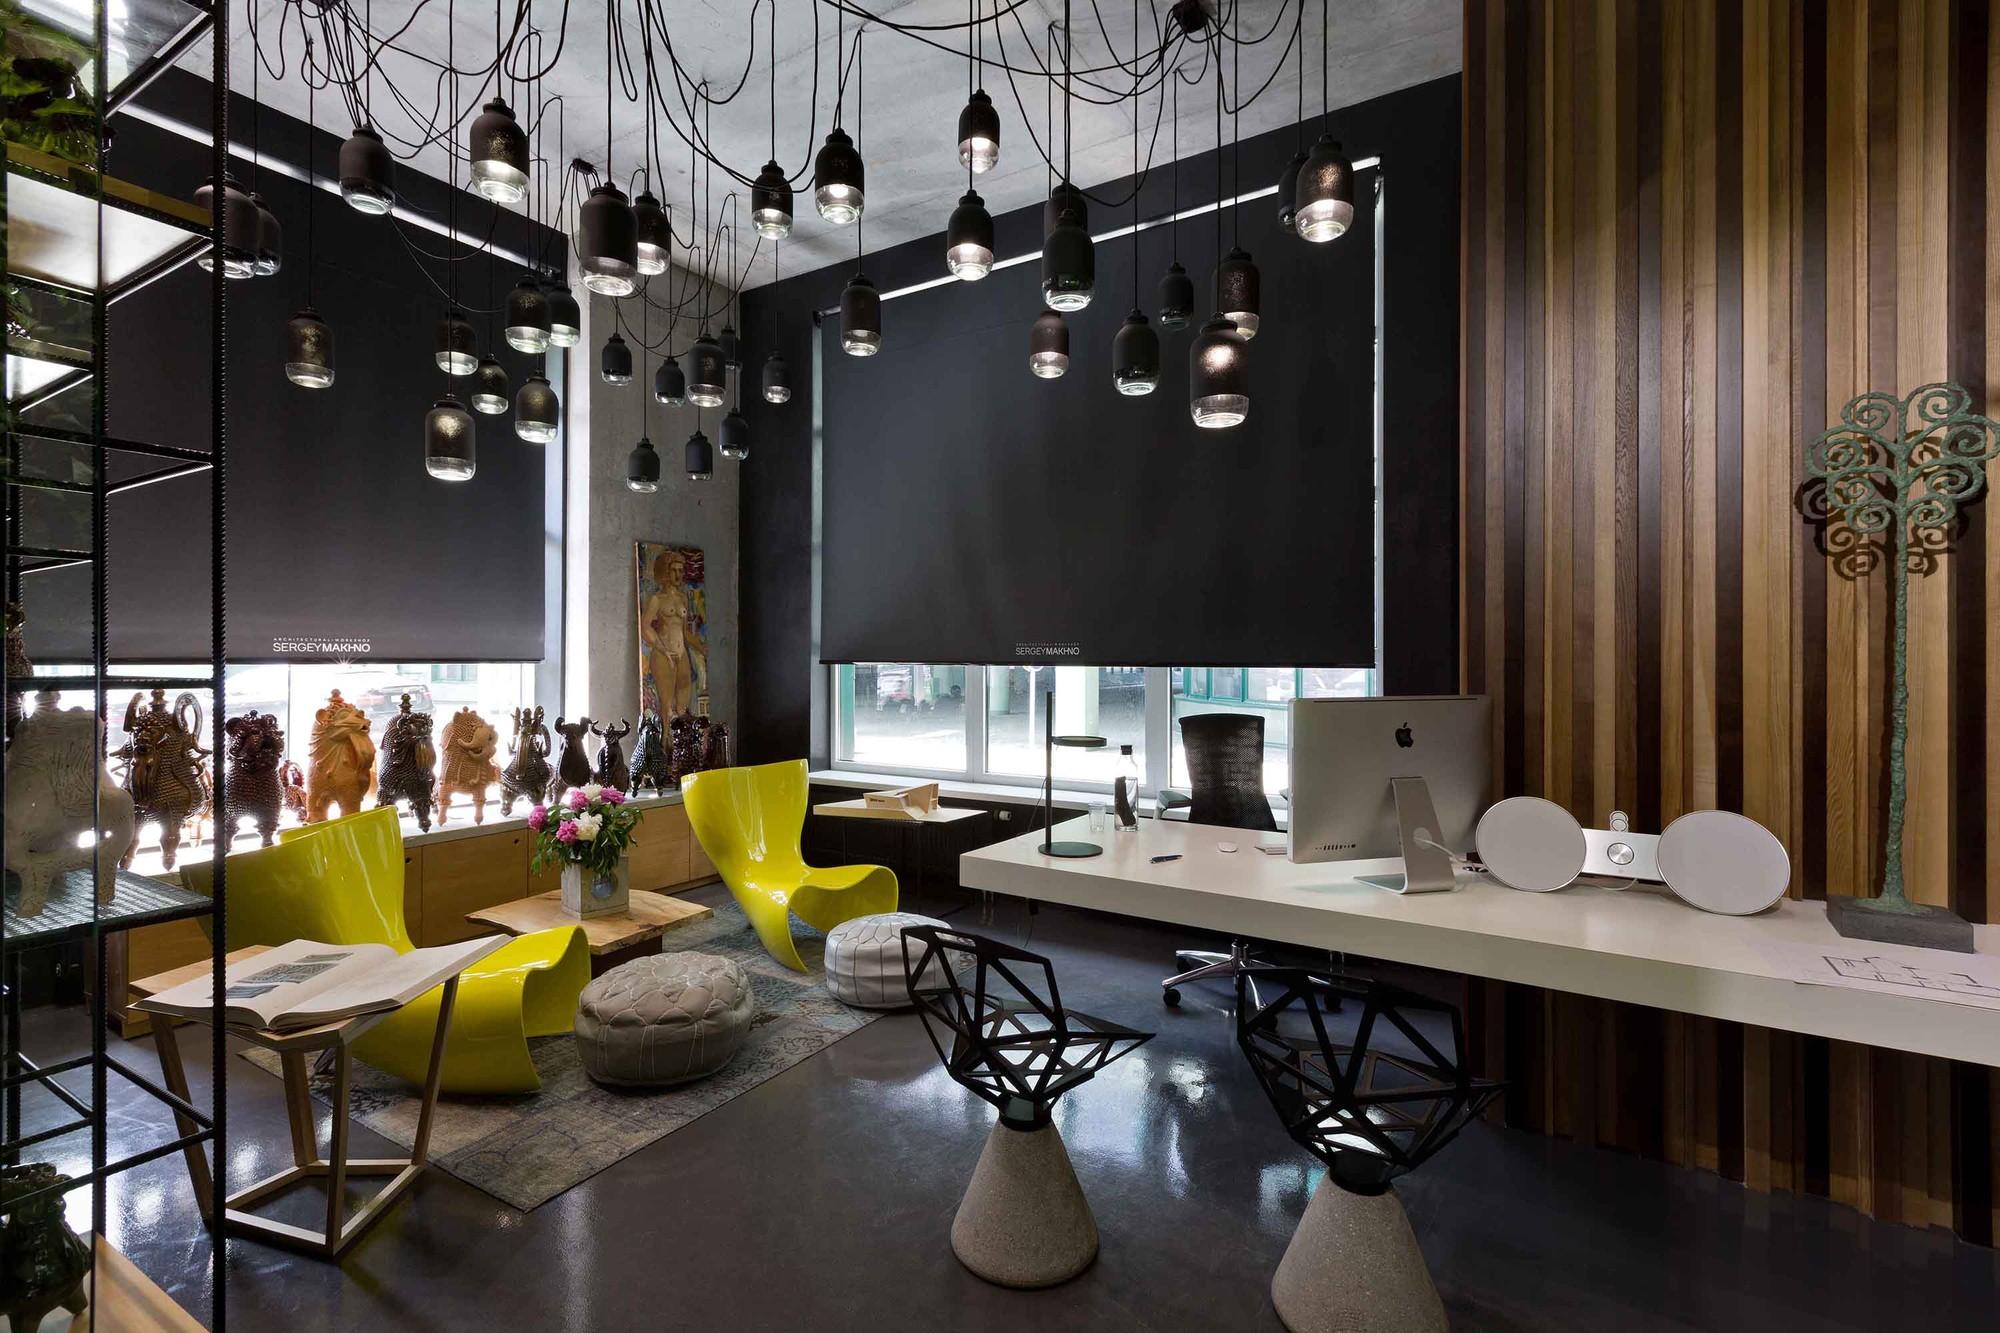 galeria de escrit rio e showroom sergey makhno sergey makhno illya tovstonog 3. Black Bedroom Furniture Sets. Home Design Ideas